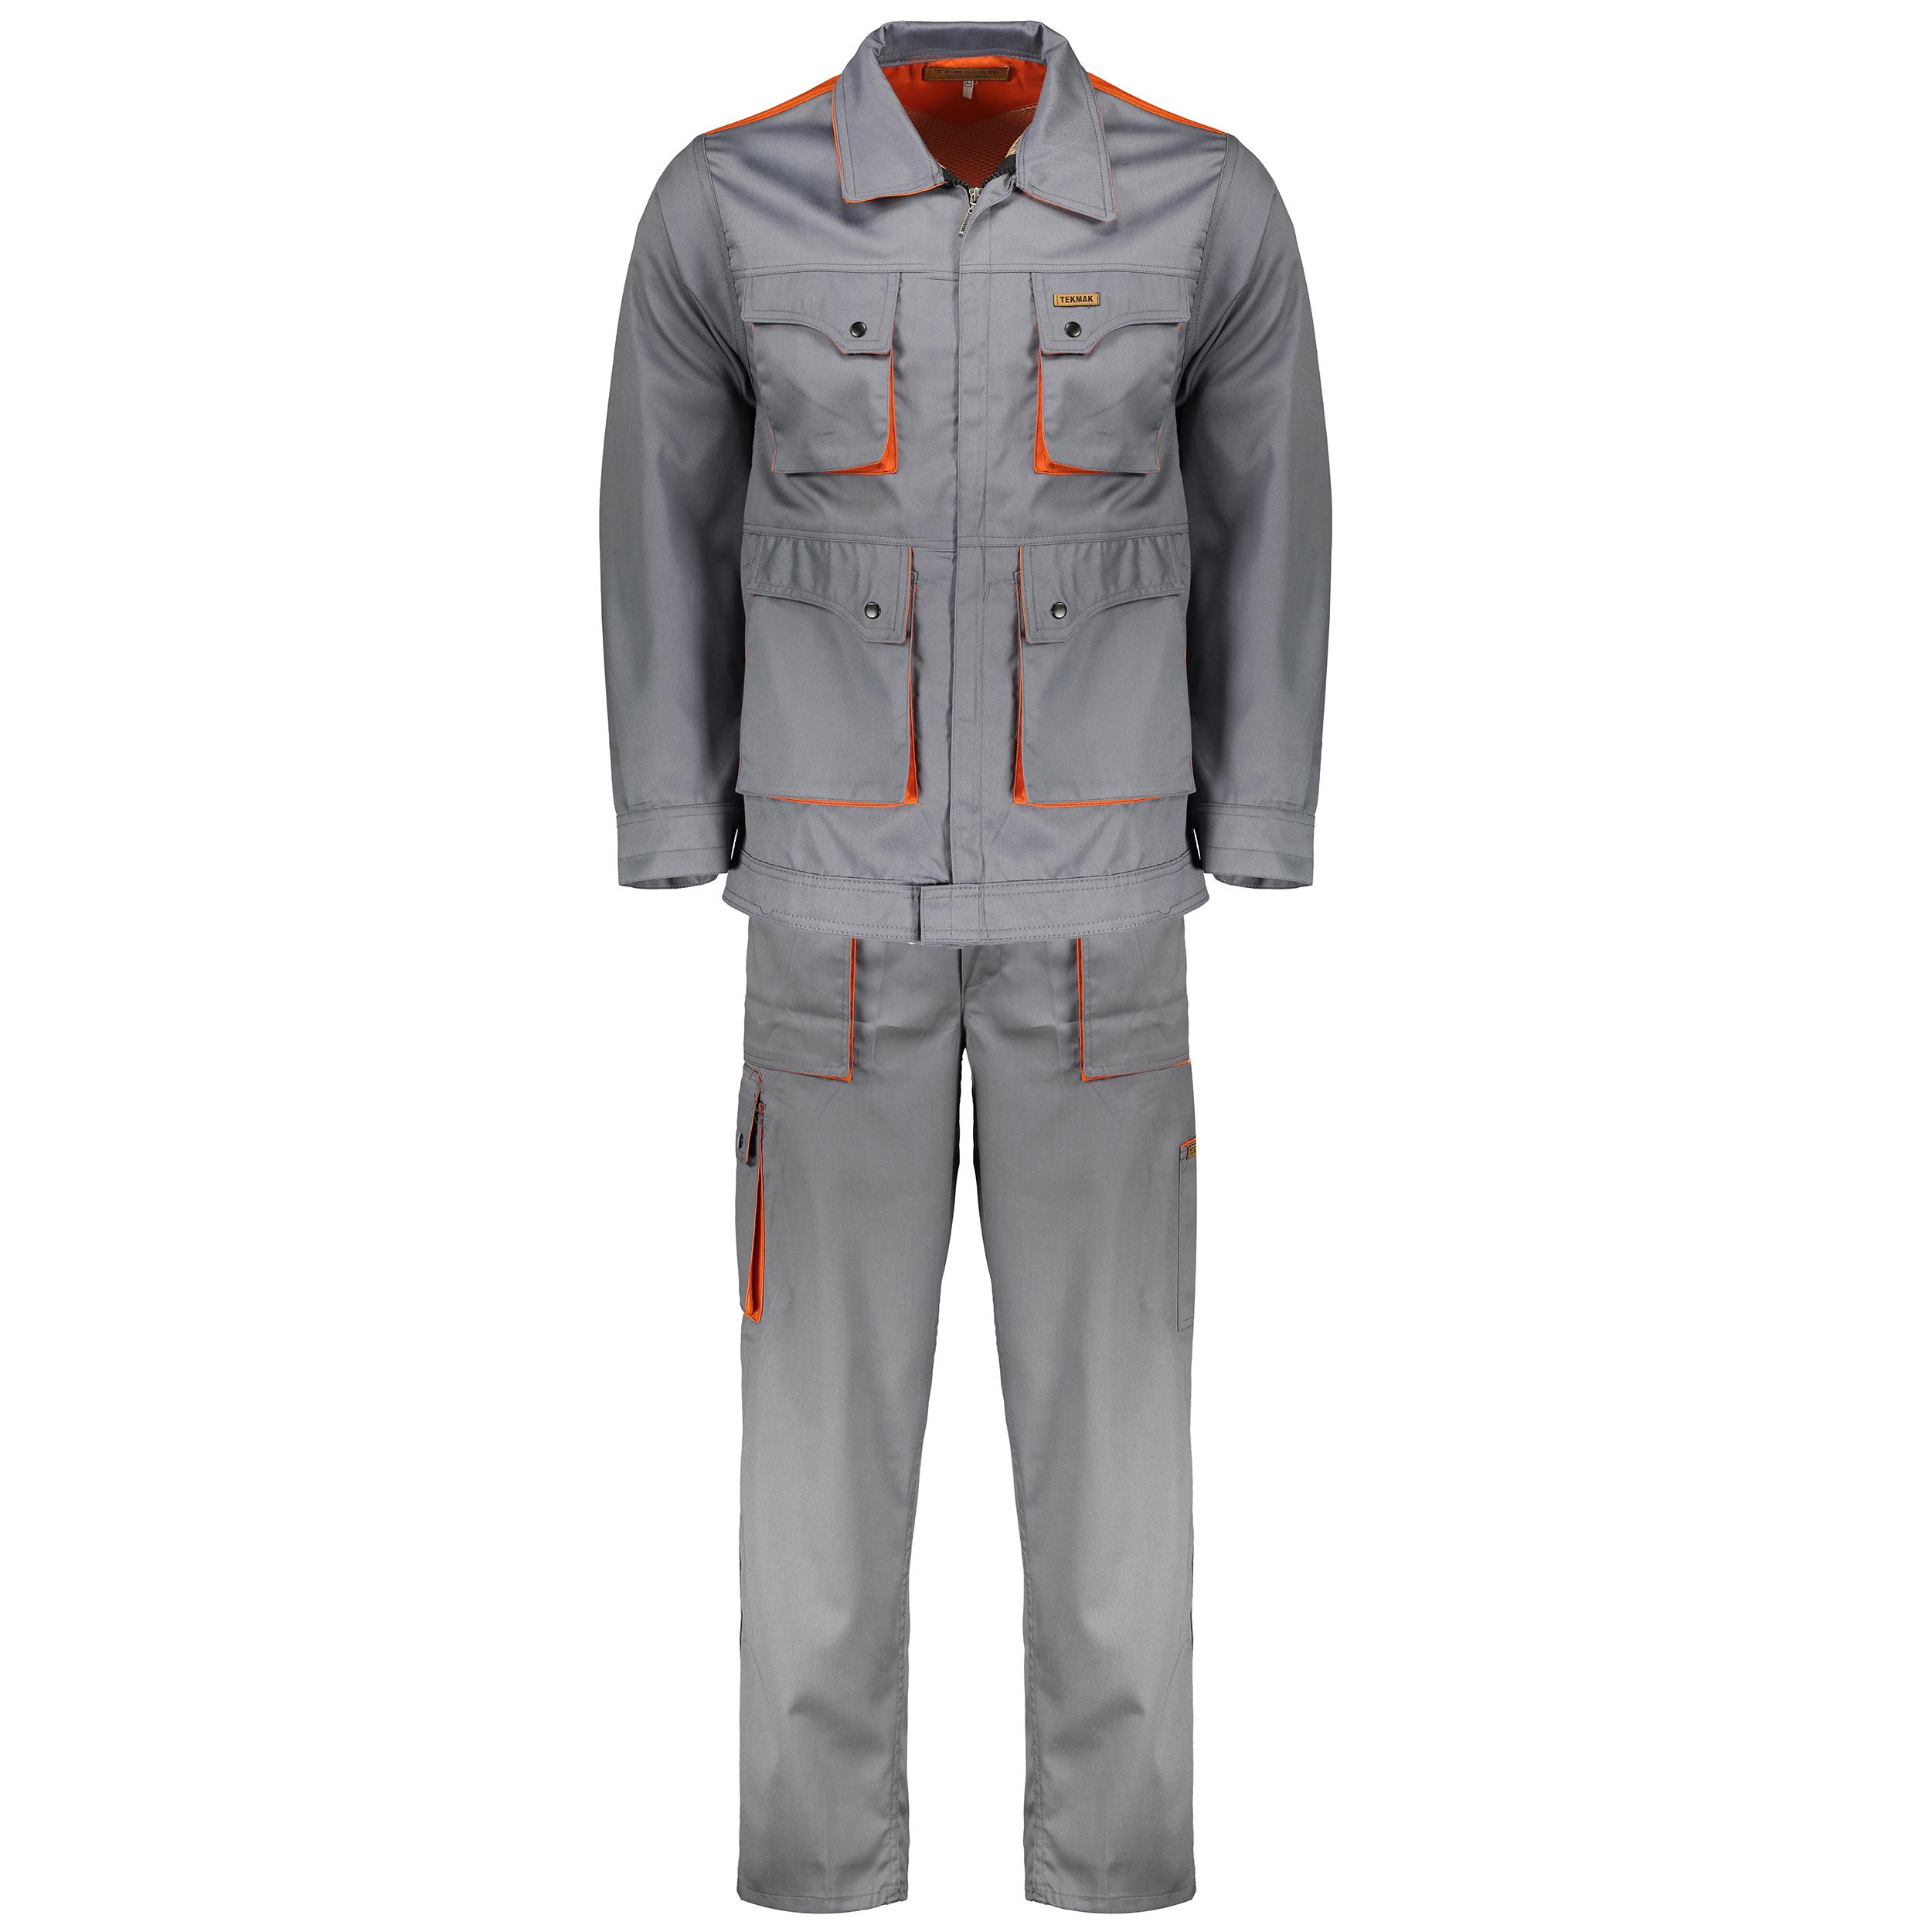 لباس کار سبلان  کد 01 مدل طوسی نارنجی